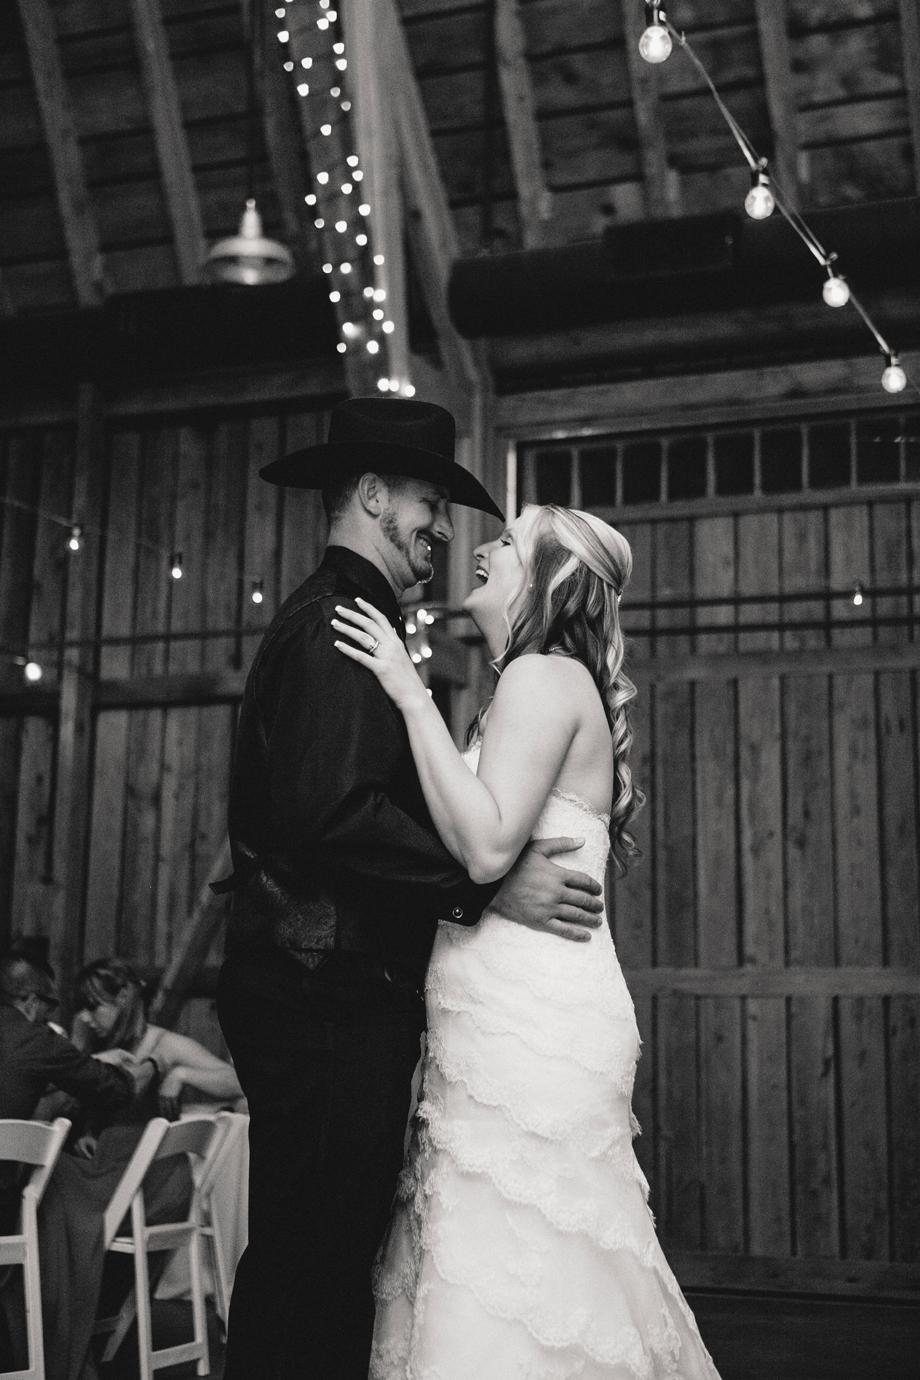 Jay & Jess, Weddings, Arizona-72.jpg